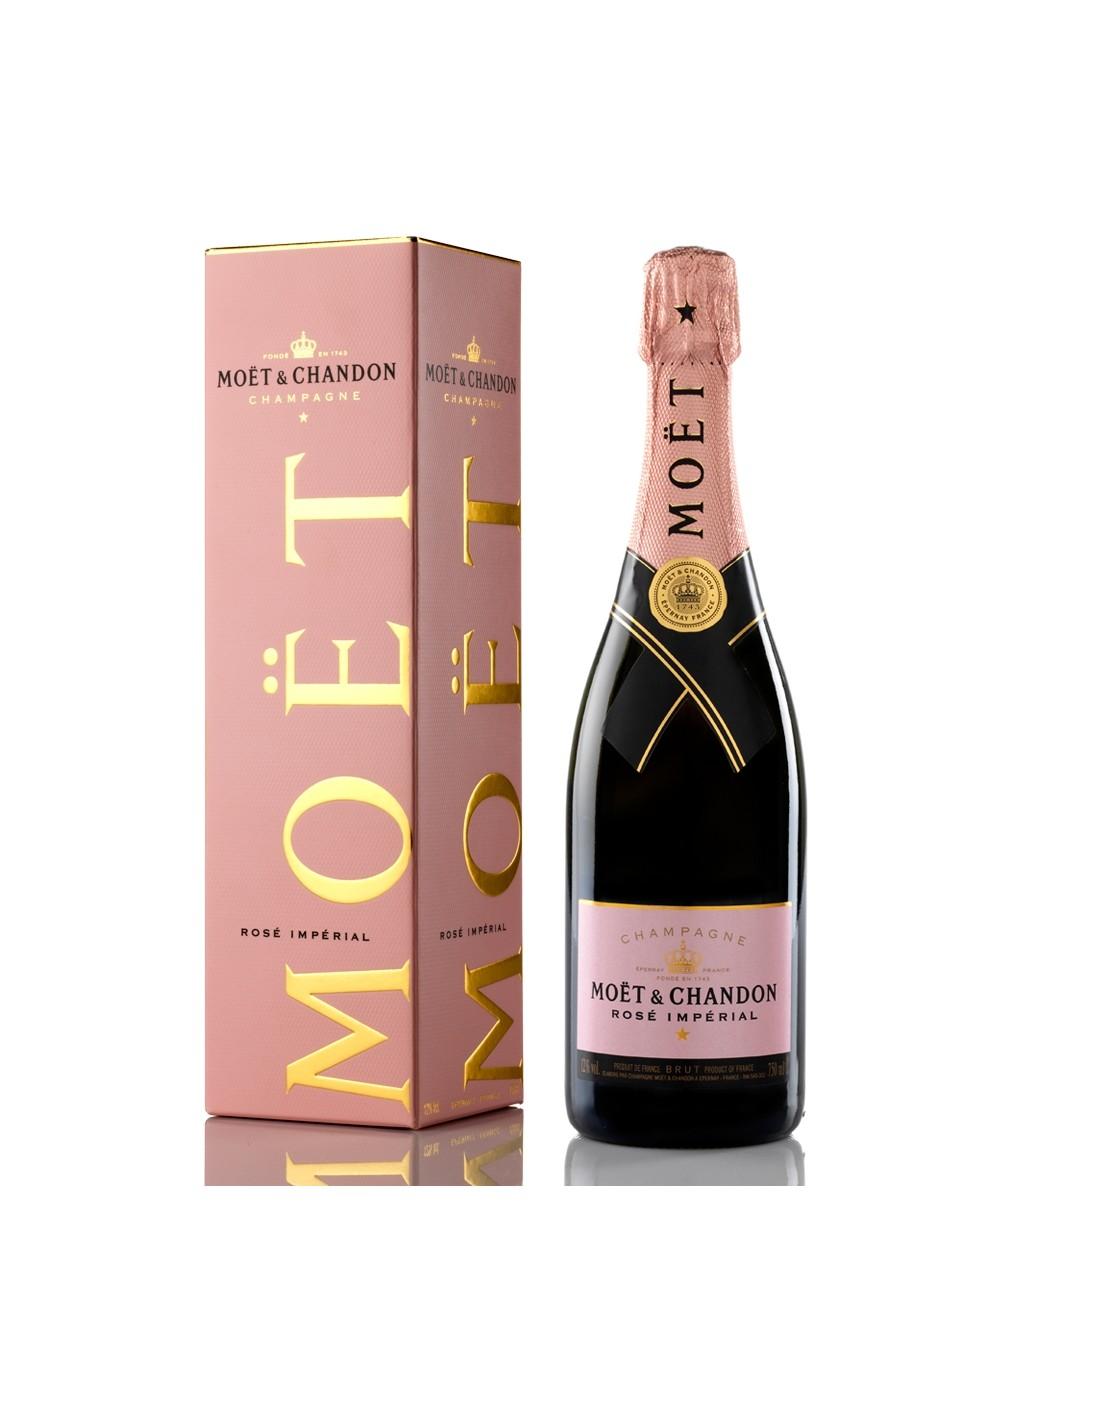 Sampanie roze, Moët & Chandon Rosé Imperial Champagne, 0.75L, 12% alc., Franta